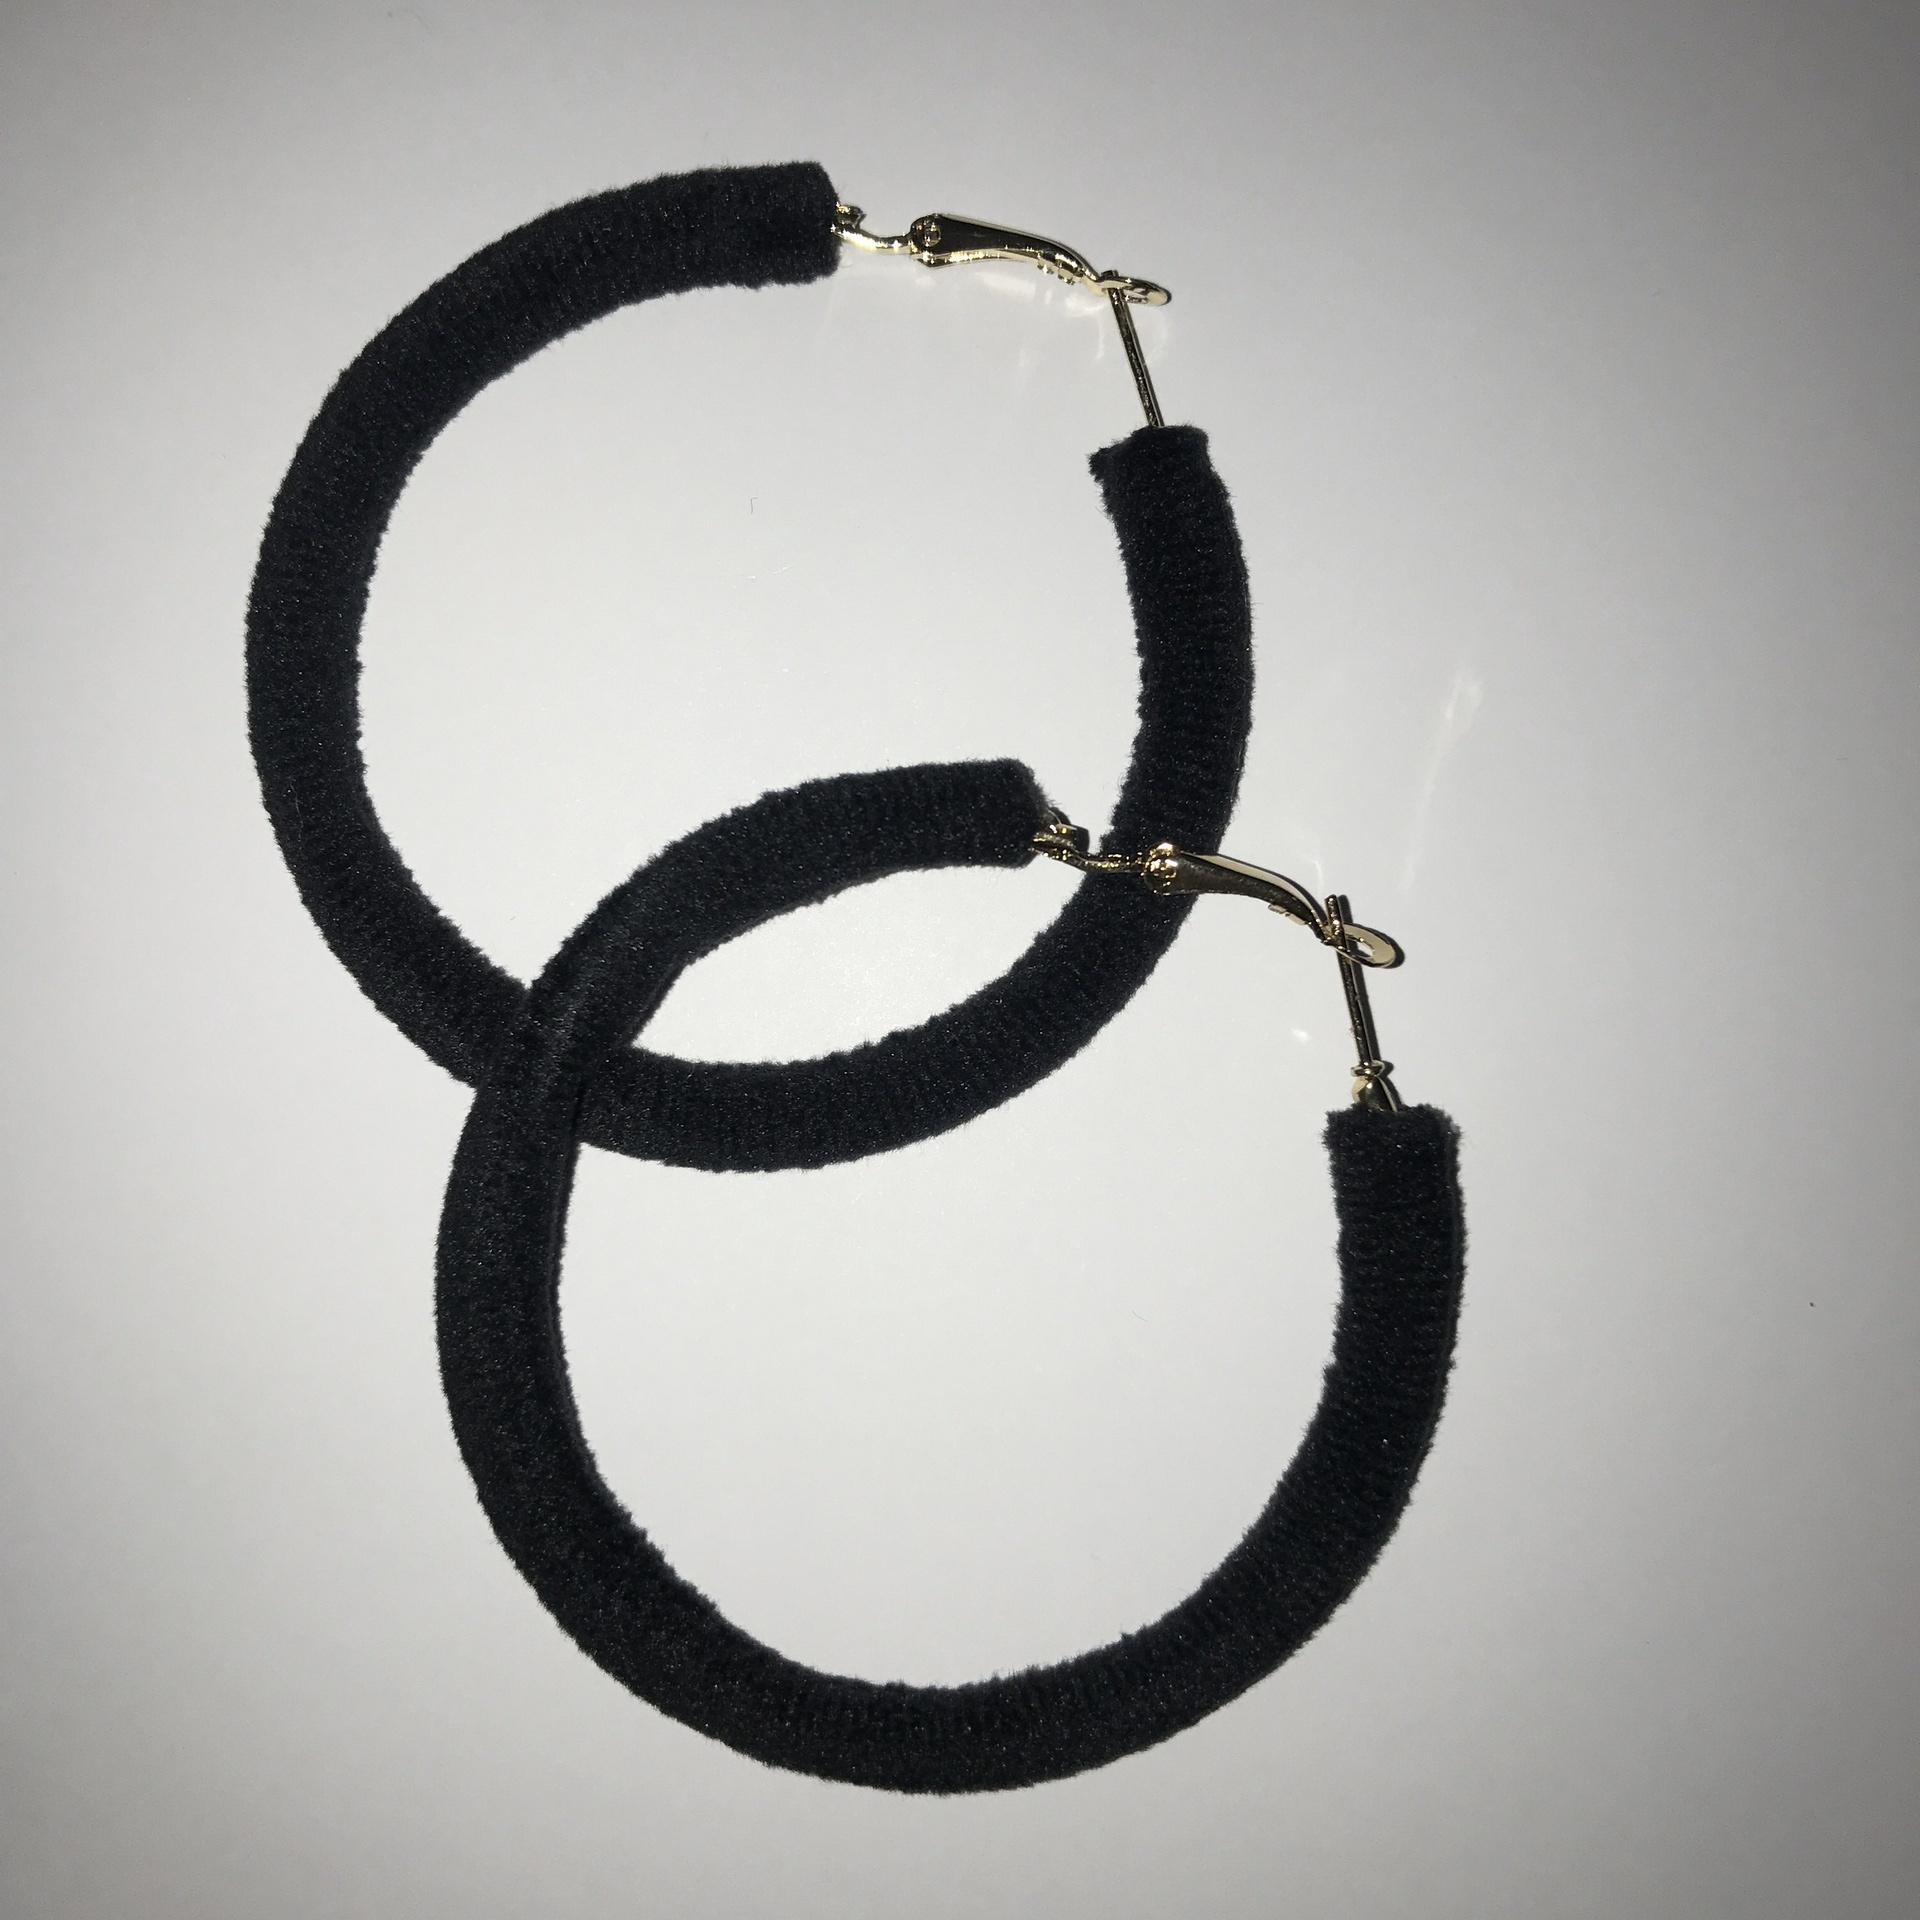 Felt Hoop Earrings